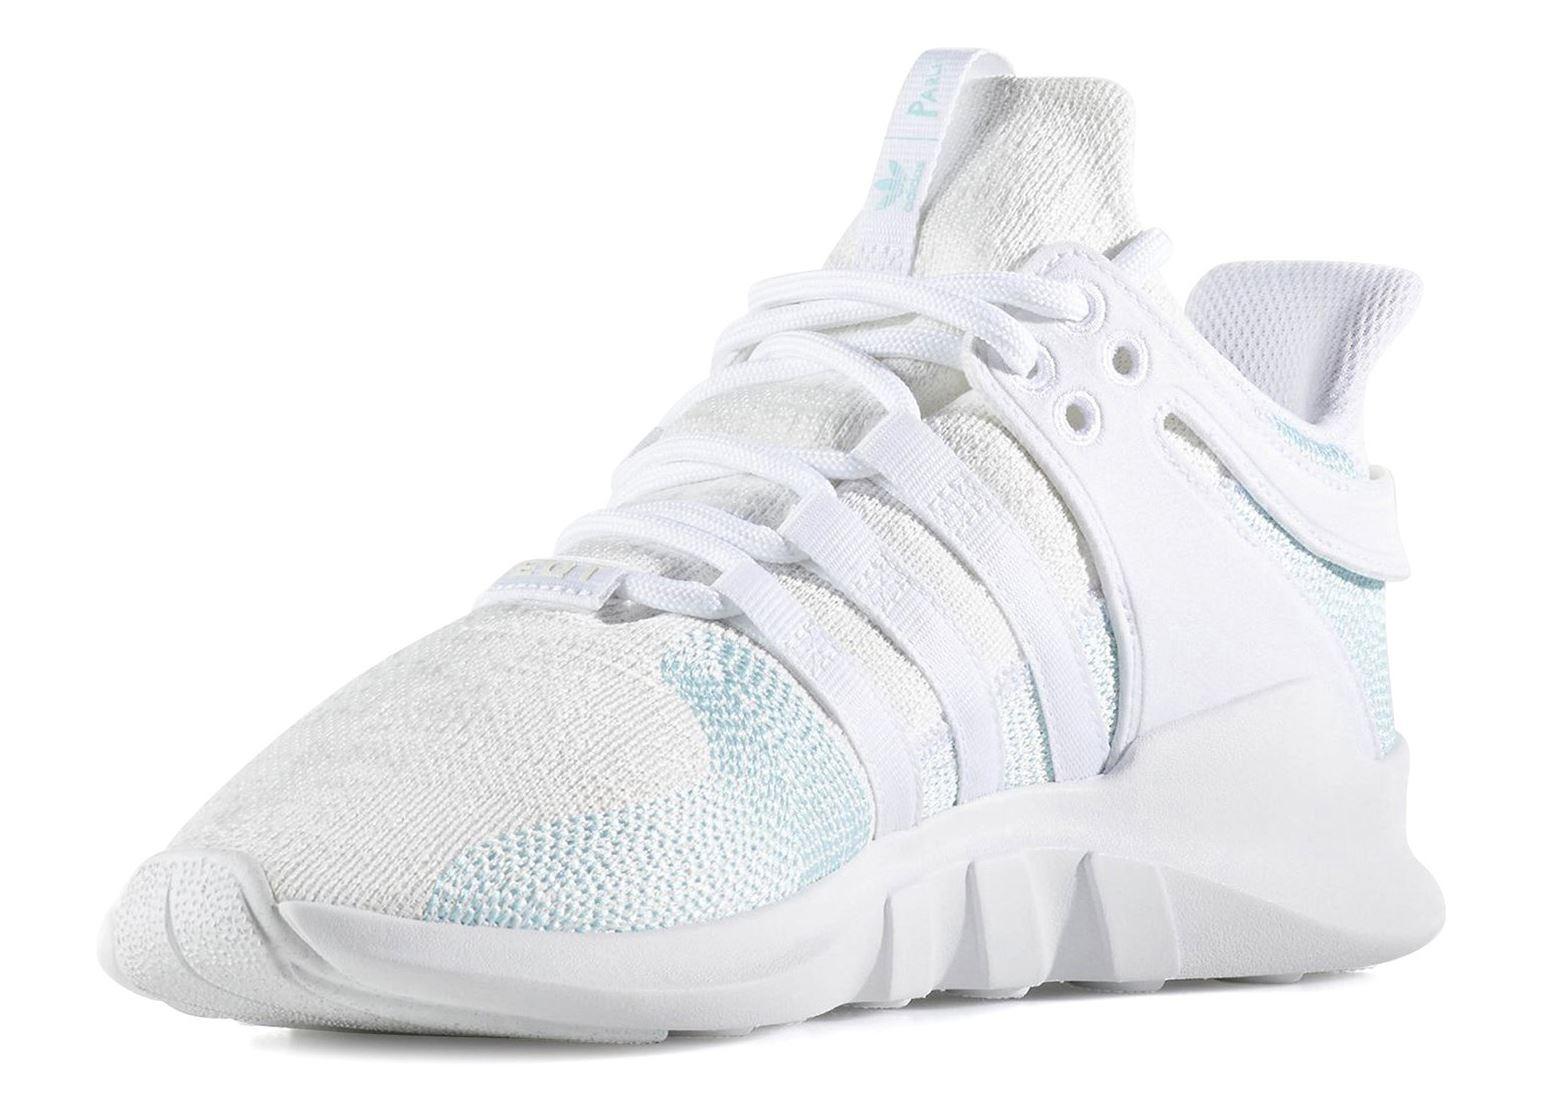 adidas-EQT-Support-ADV-Mens-Trainers-Originals-RRP-90-SAVE-039-S-MOST-SIZES miniatuur 4